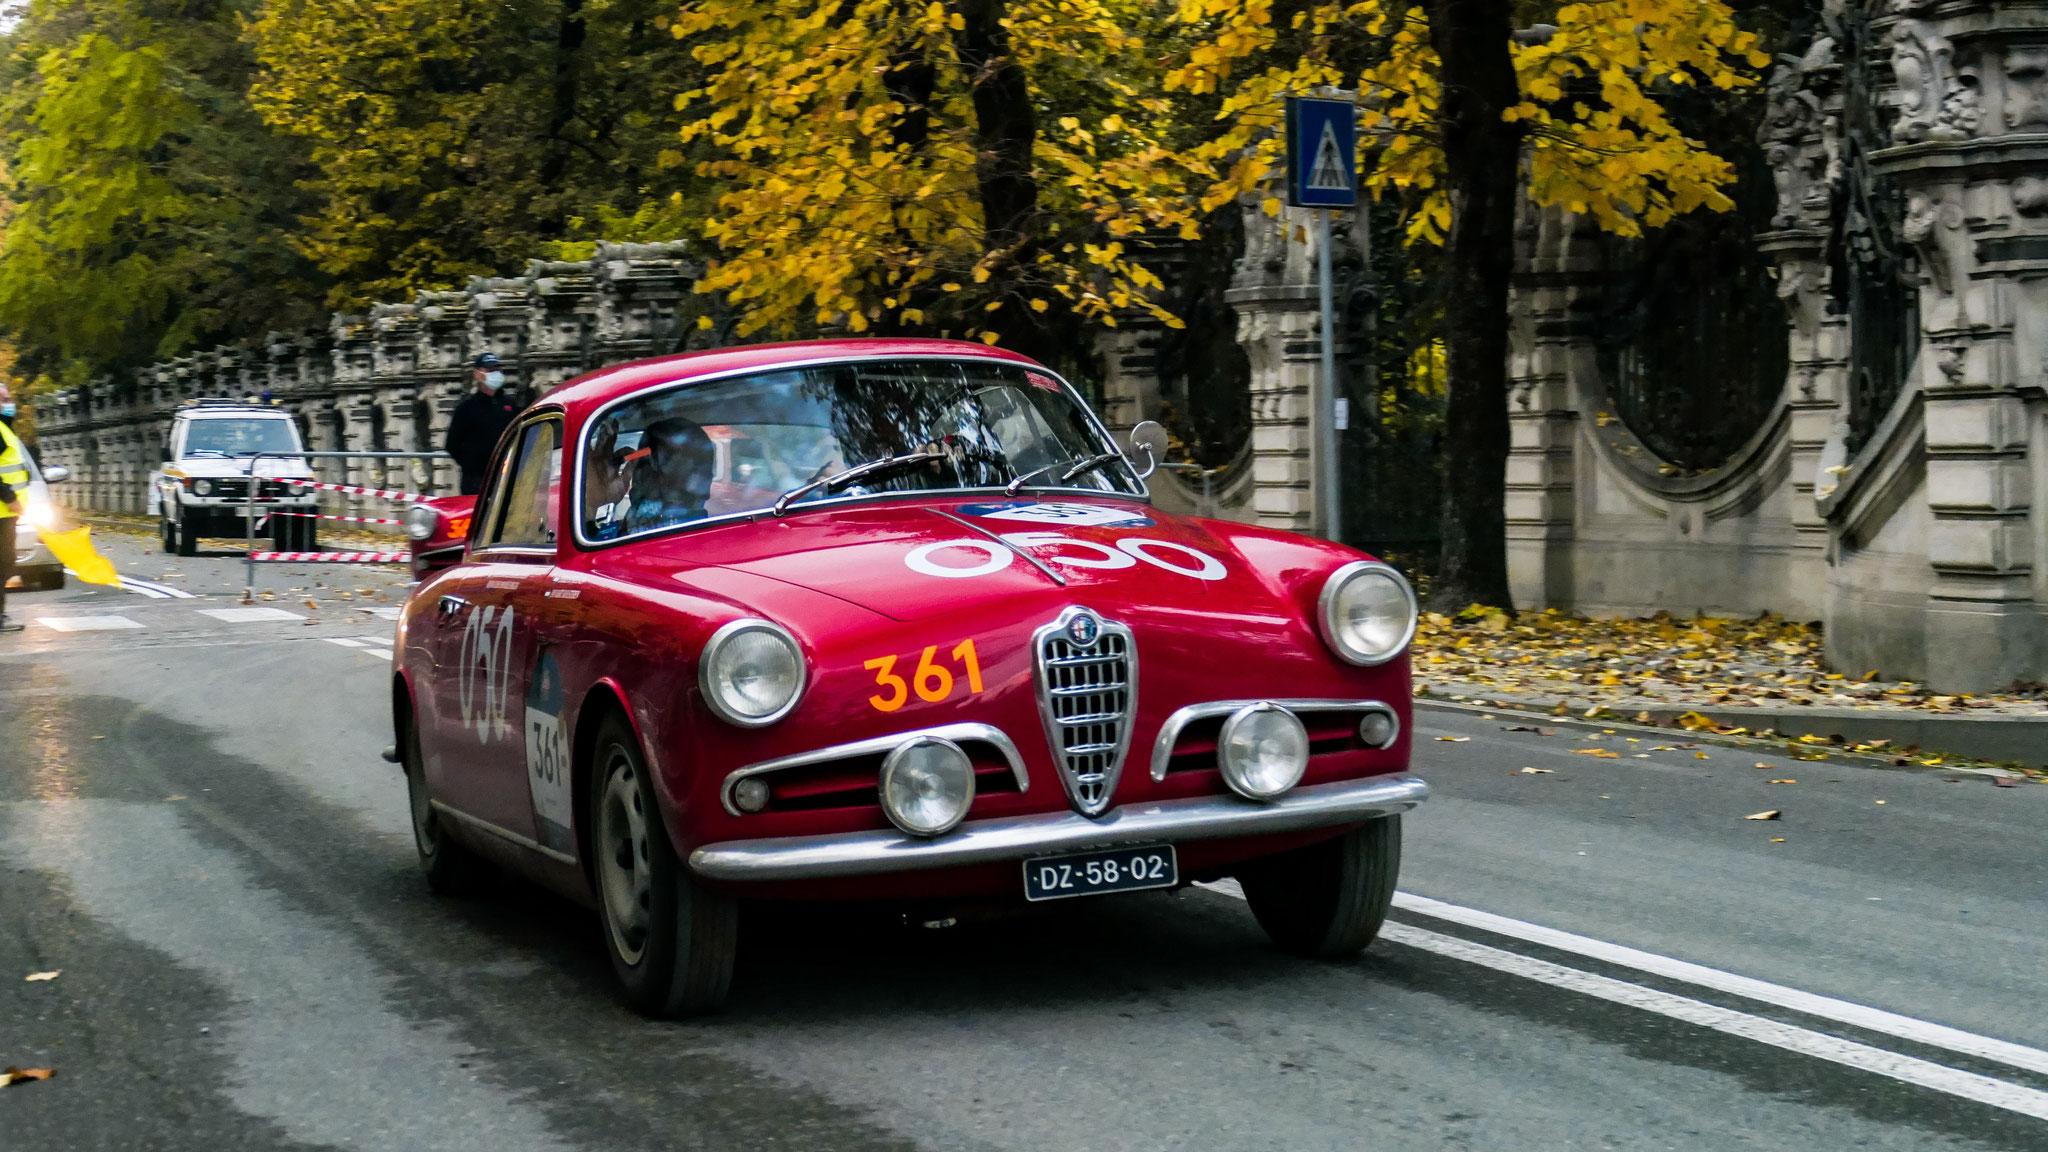 Alfa Romeo 1900C Super Sprint Touring - DZ-58-02 (NL)